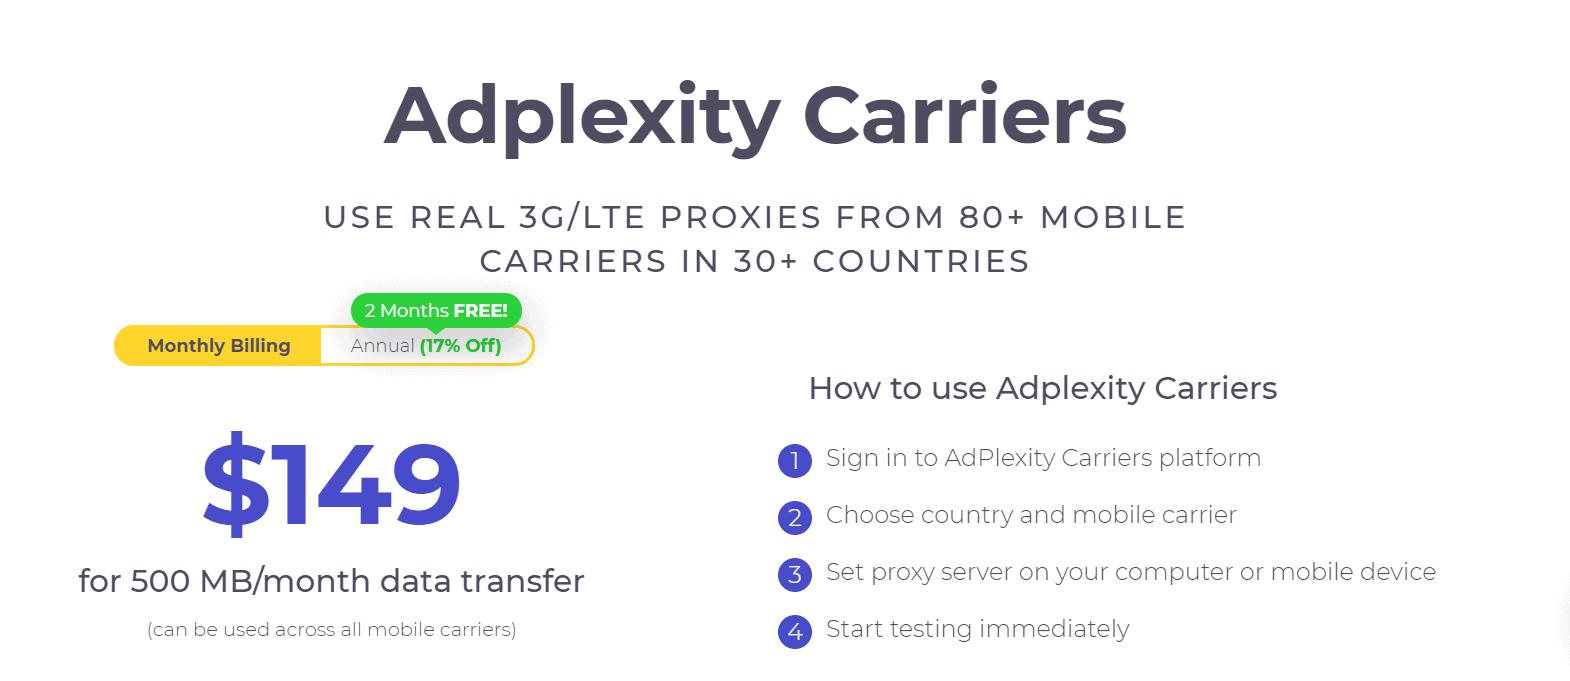 adplexity carriers plan